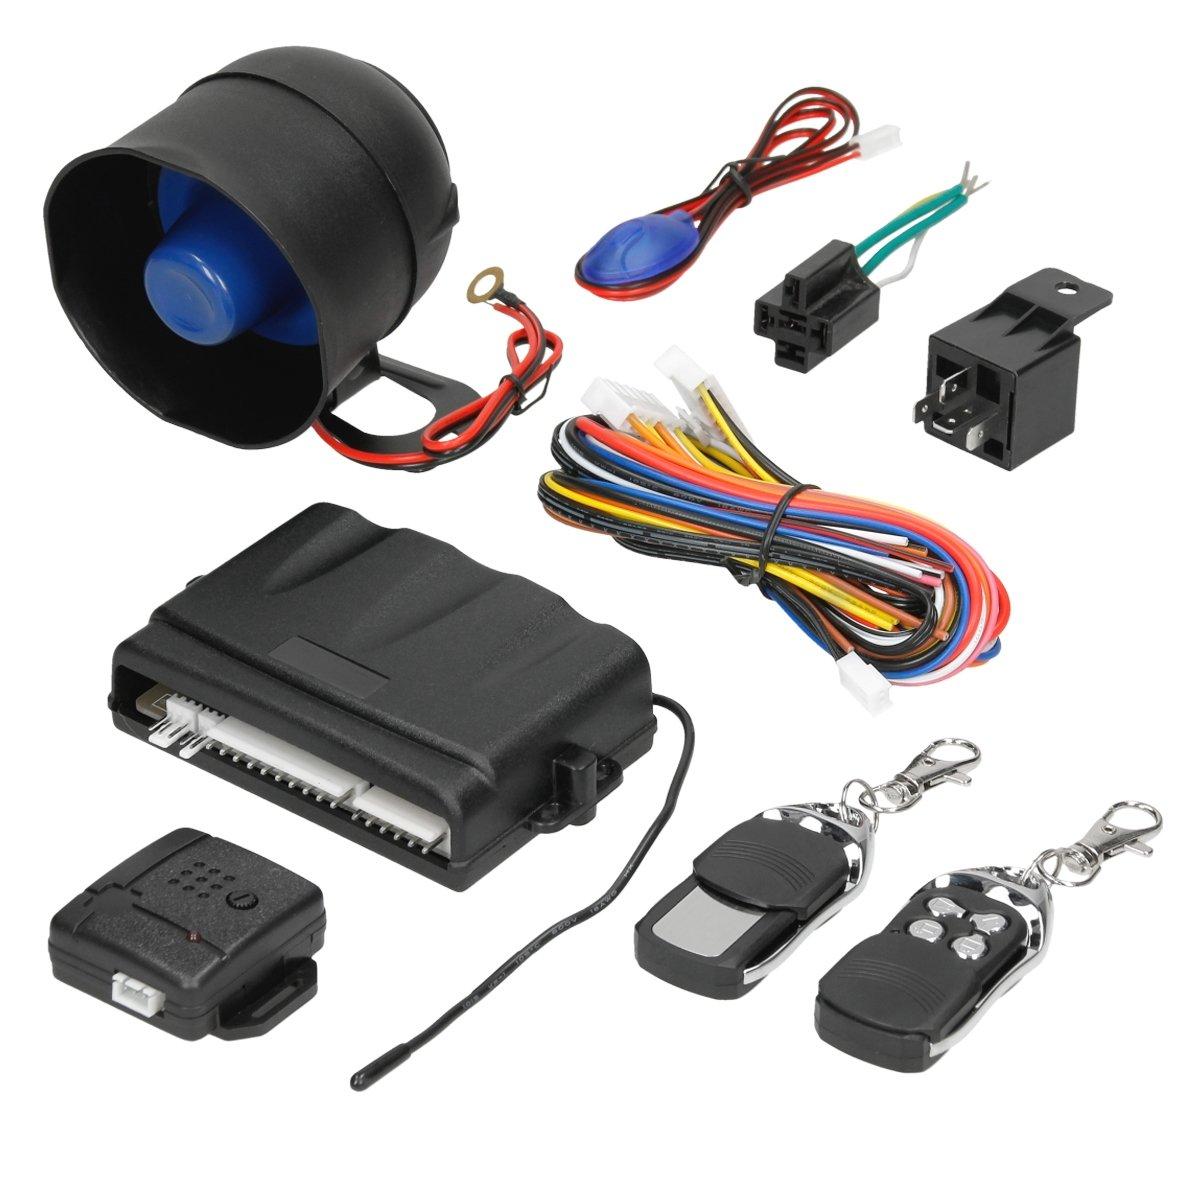 ECD Germany Universal KFZ Alarm - Alarmanlage Melder - mit Memory Funktion - inkl. Funkfernbedienung - Auto-Sicherheits-Alarmsystem